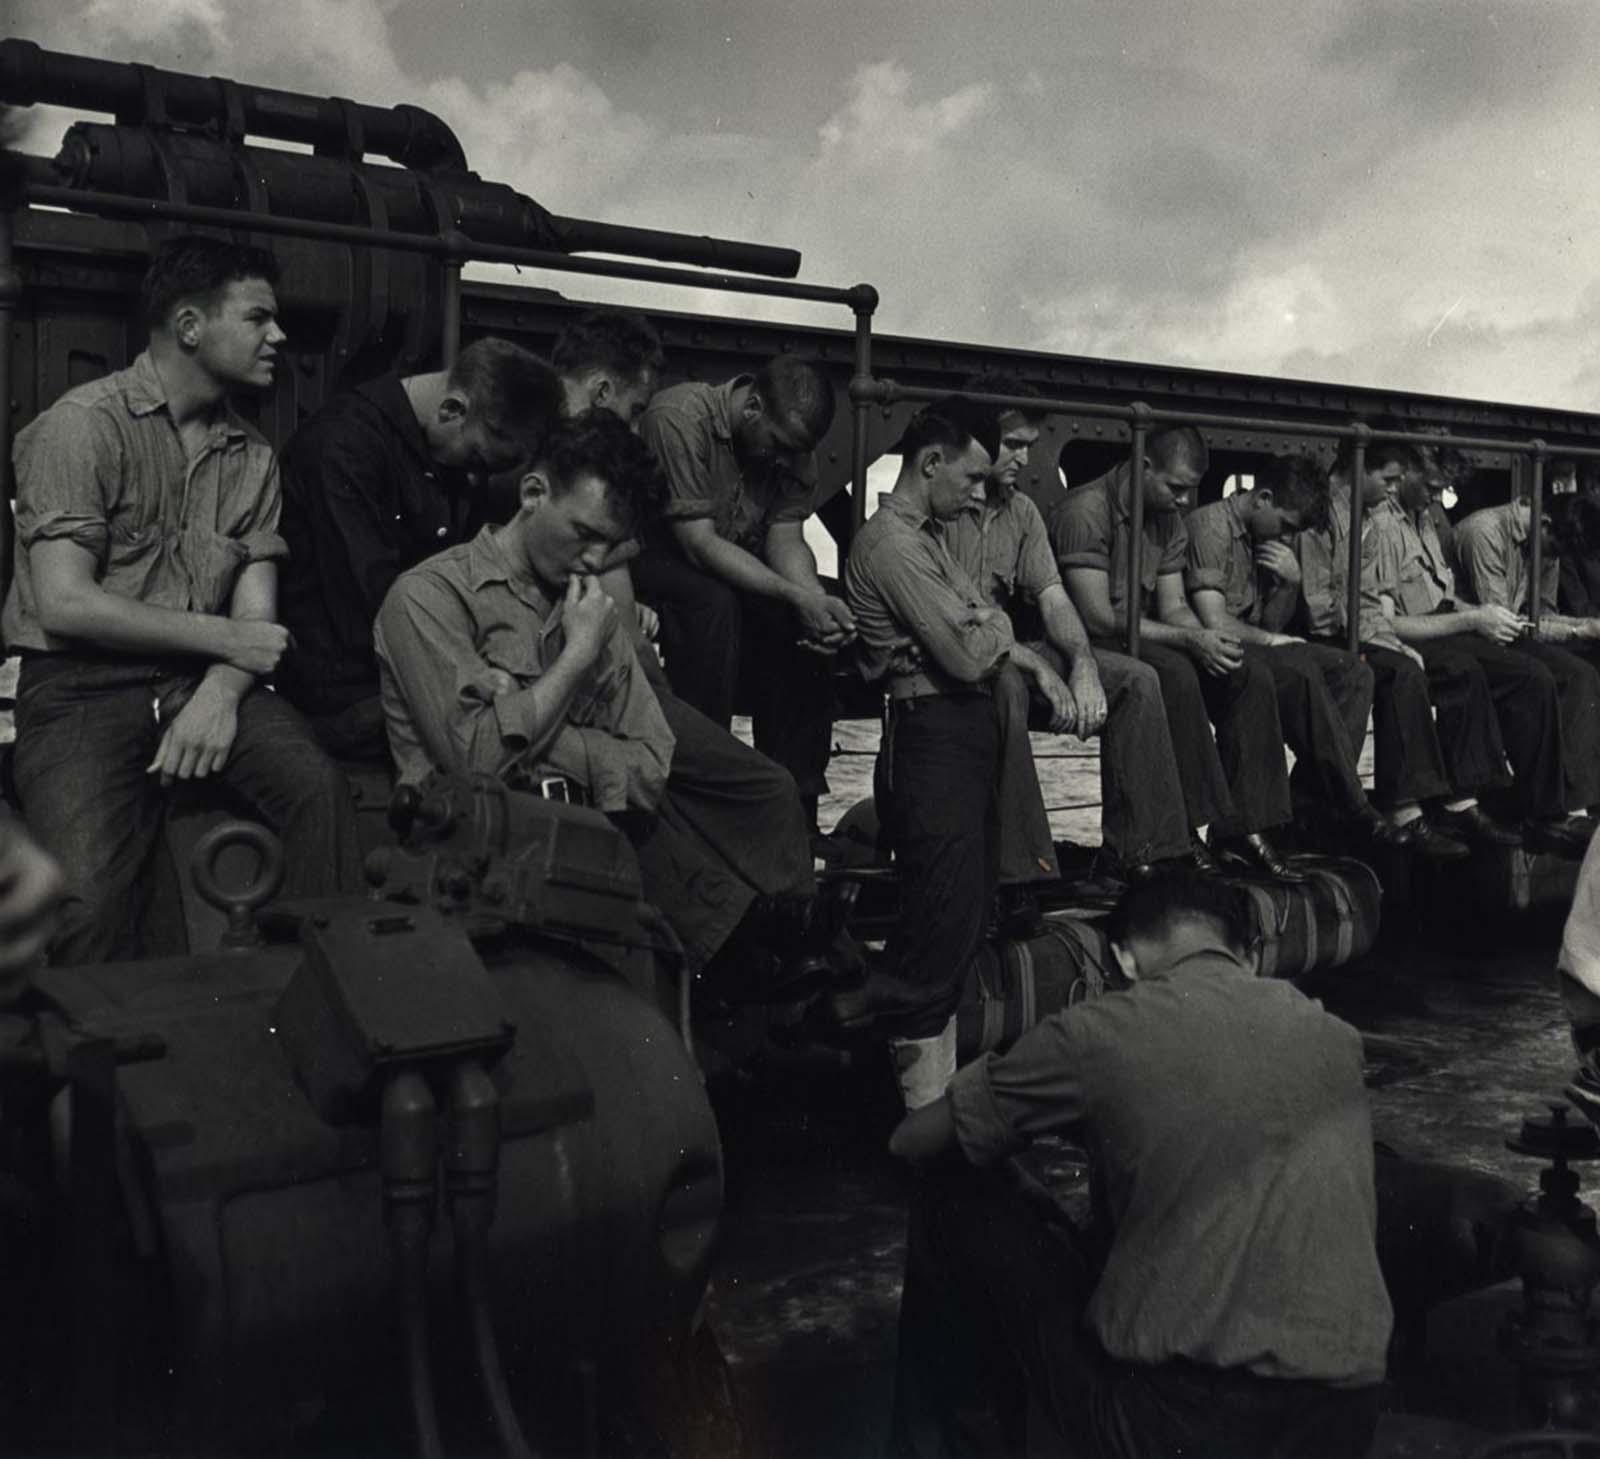 Sailors Aboard U.S.S. Yorktown, c. 1943.